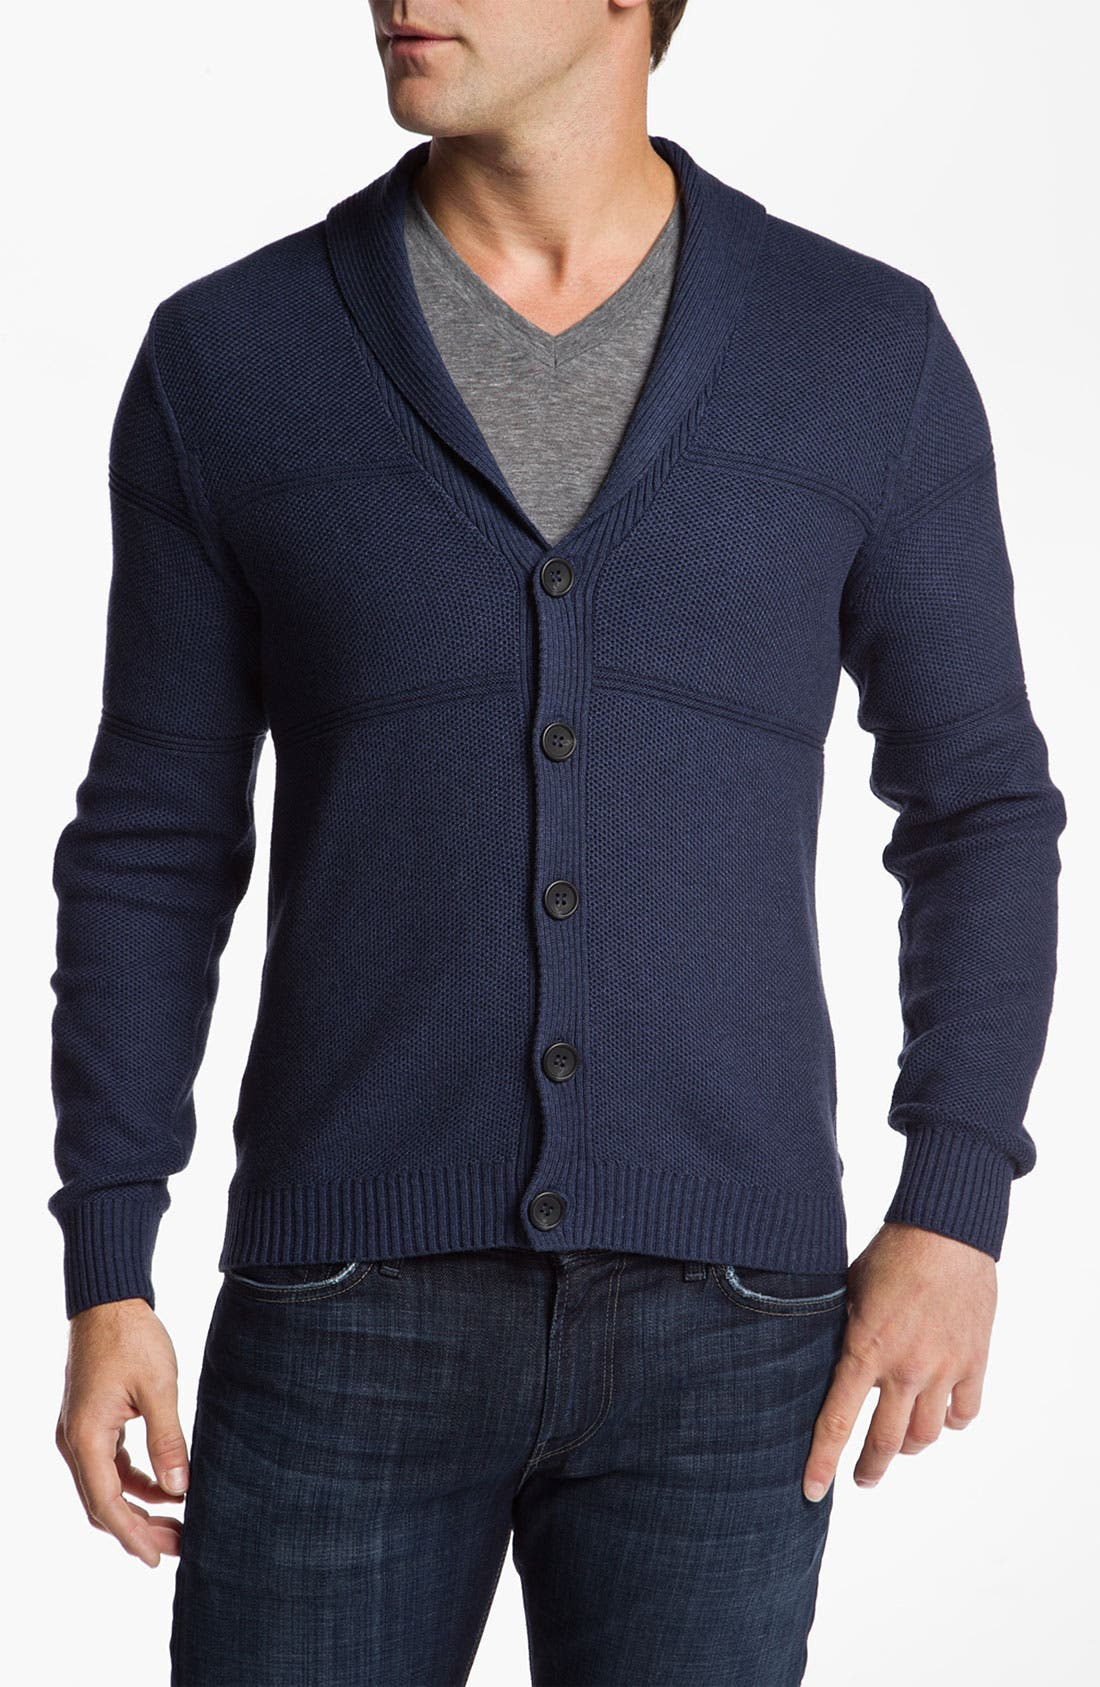 Main Image - 7 For All Mankind® Shawl Collar Cardigan